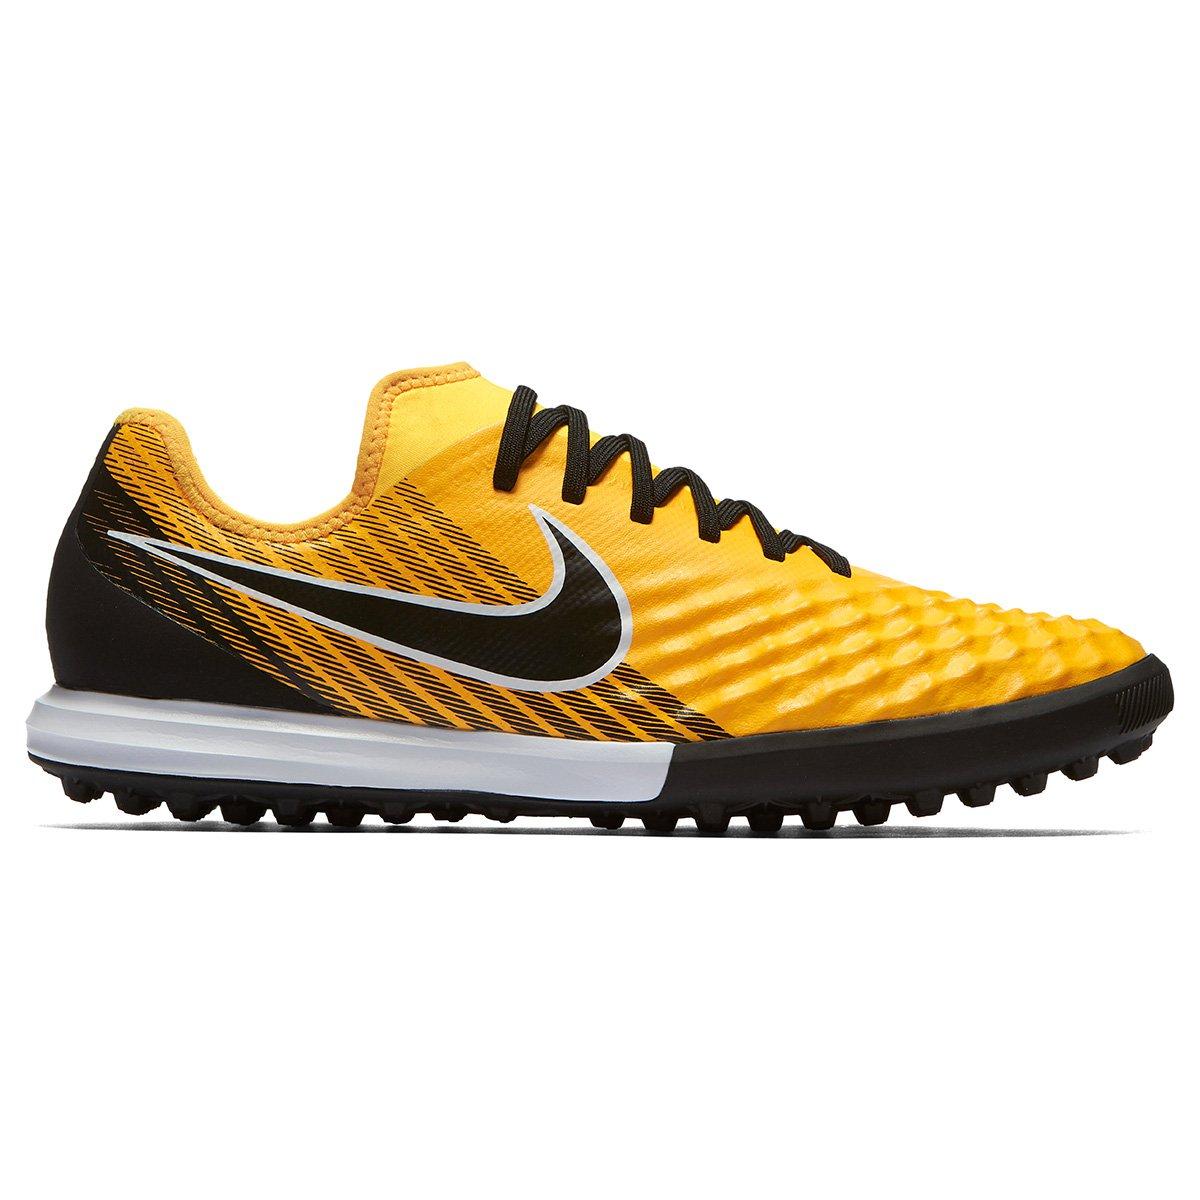 ... special section 549e4 e1ade Chuteira Society Nike Magista Finale 2 TF  Masculina .. ... 4b8a48fe77ad3